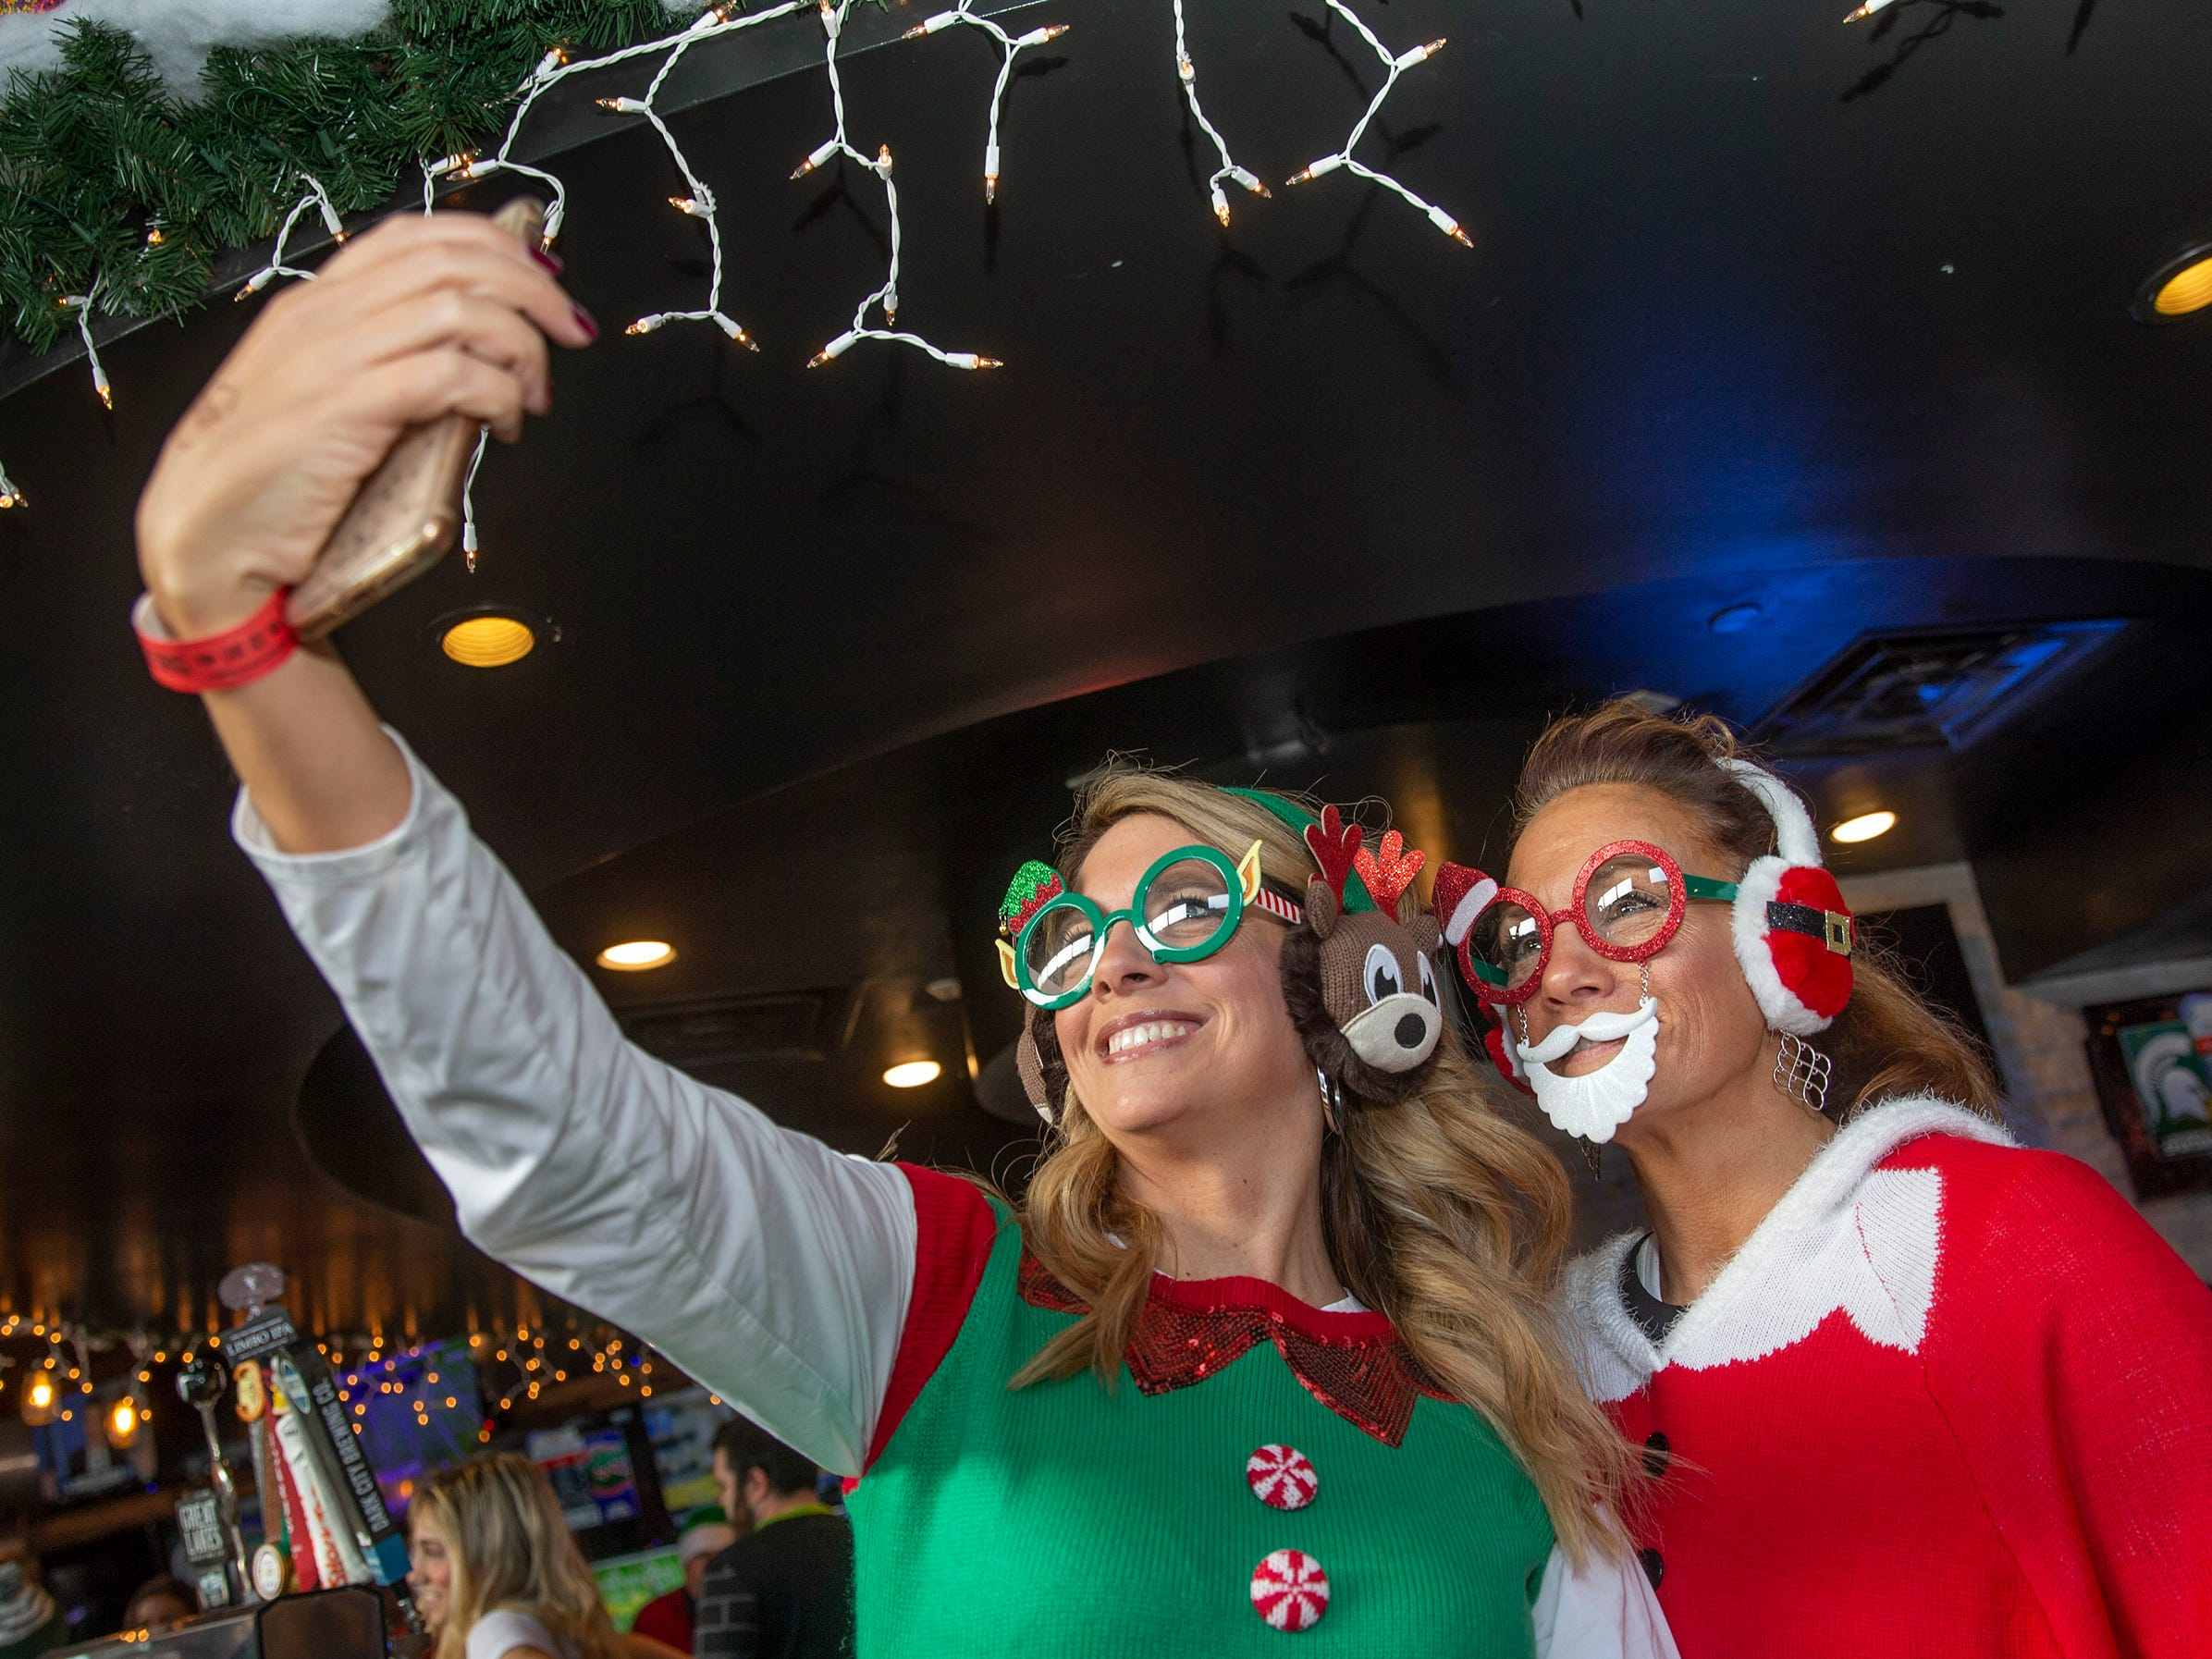 Patrons at Asbury Ale House take a selfie at SantaCon Bar Crawl through Asbury Park on December 8, 2018.